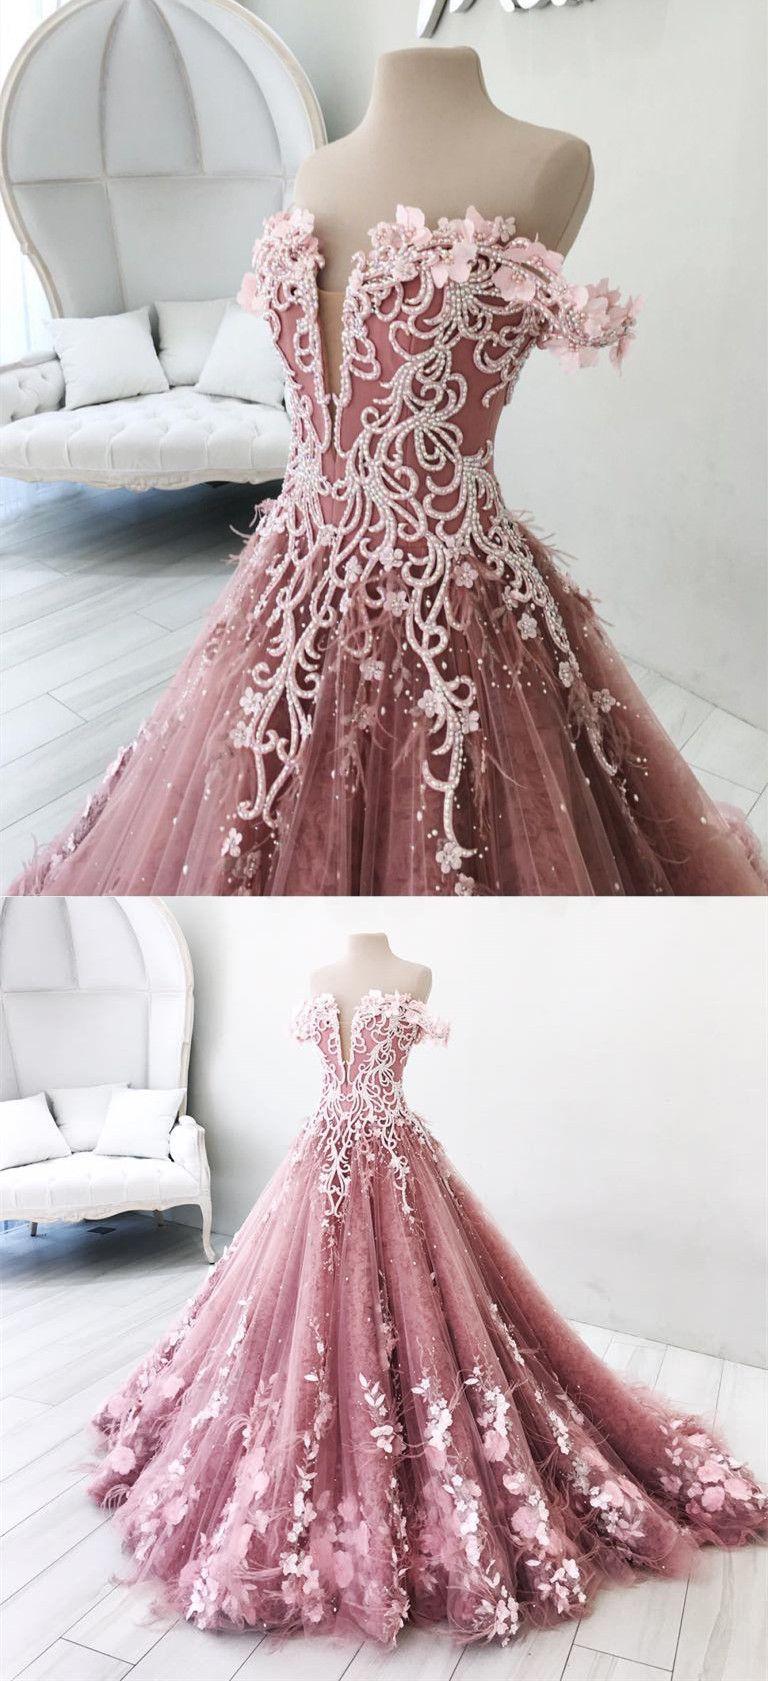 ff07b6a79b dreamy pink off shoulder prom party dresses